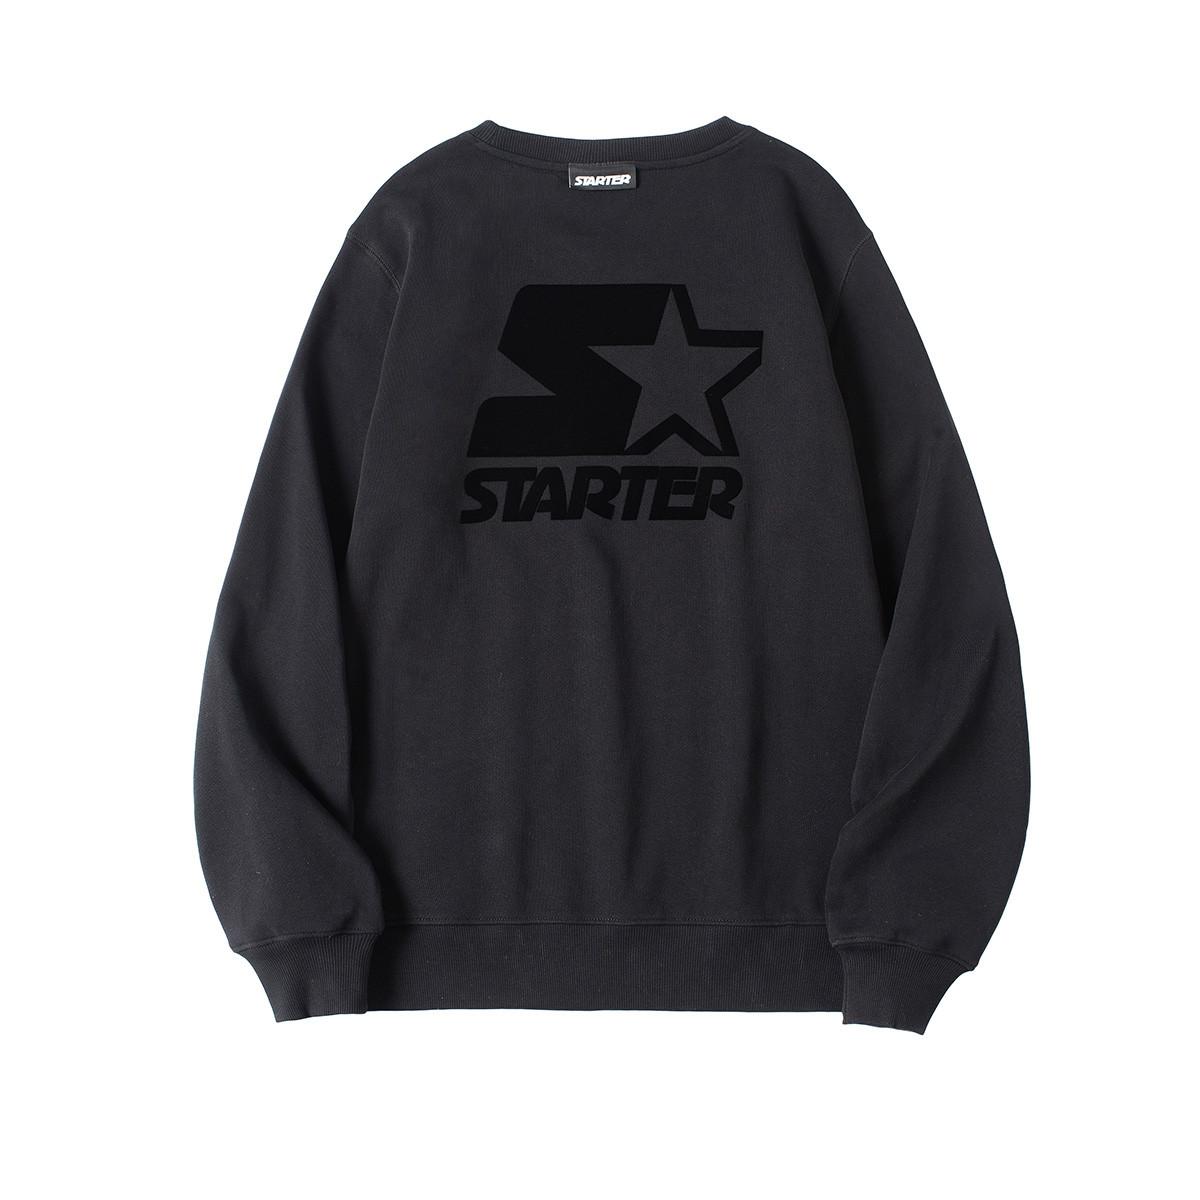 STARTER 美国高端starter潮牌男式套头卫衣 黑色 M